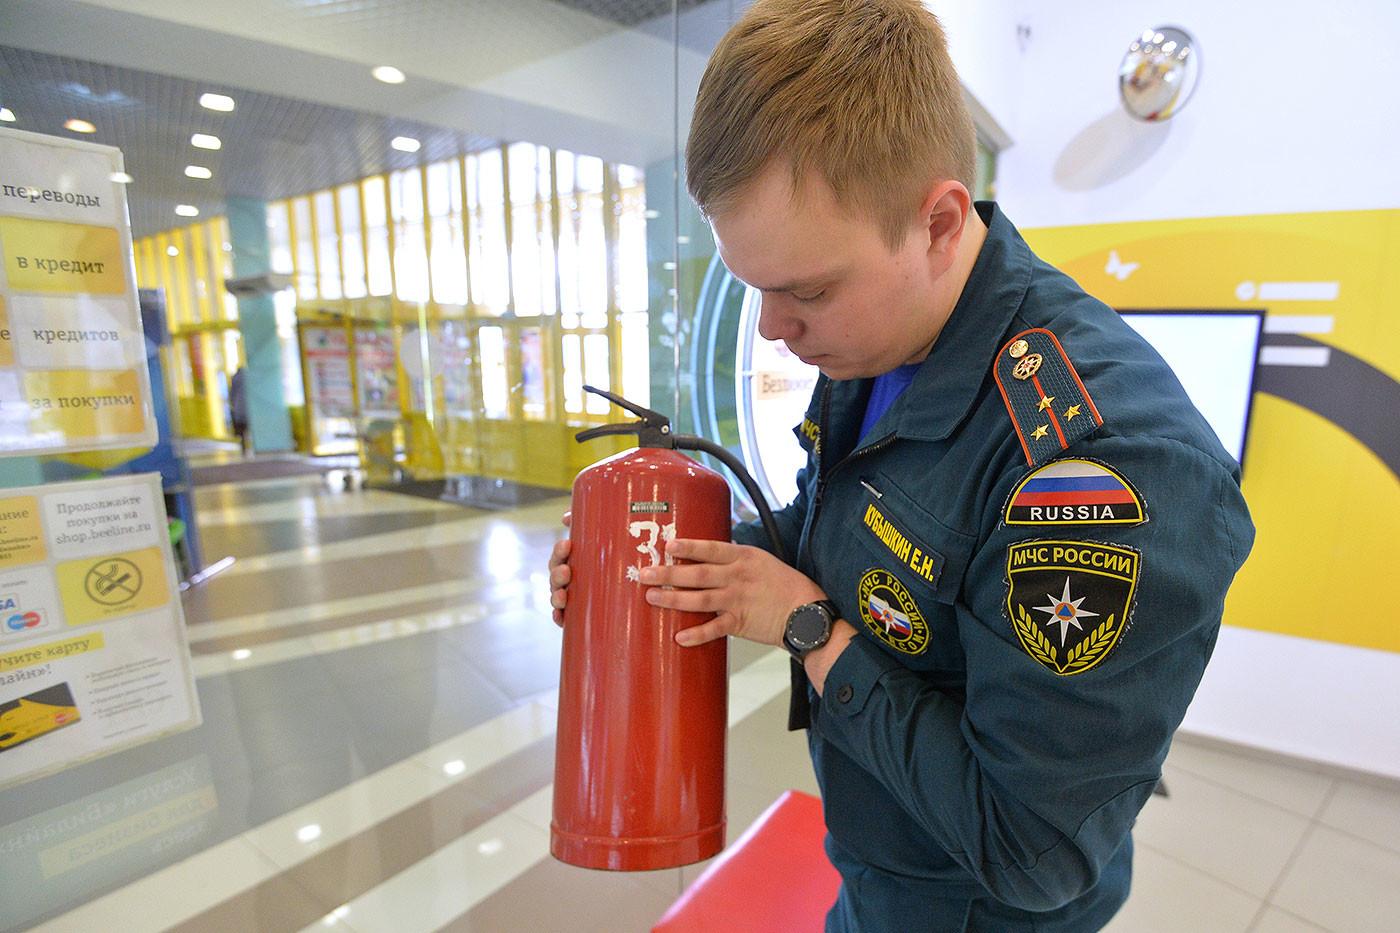 Фото: © РИА Новости/Александр Кондратюк